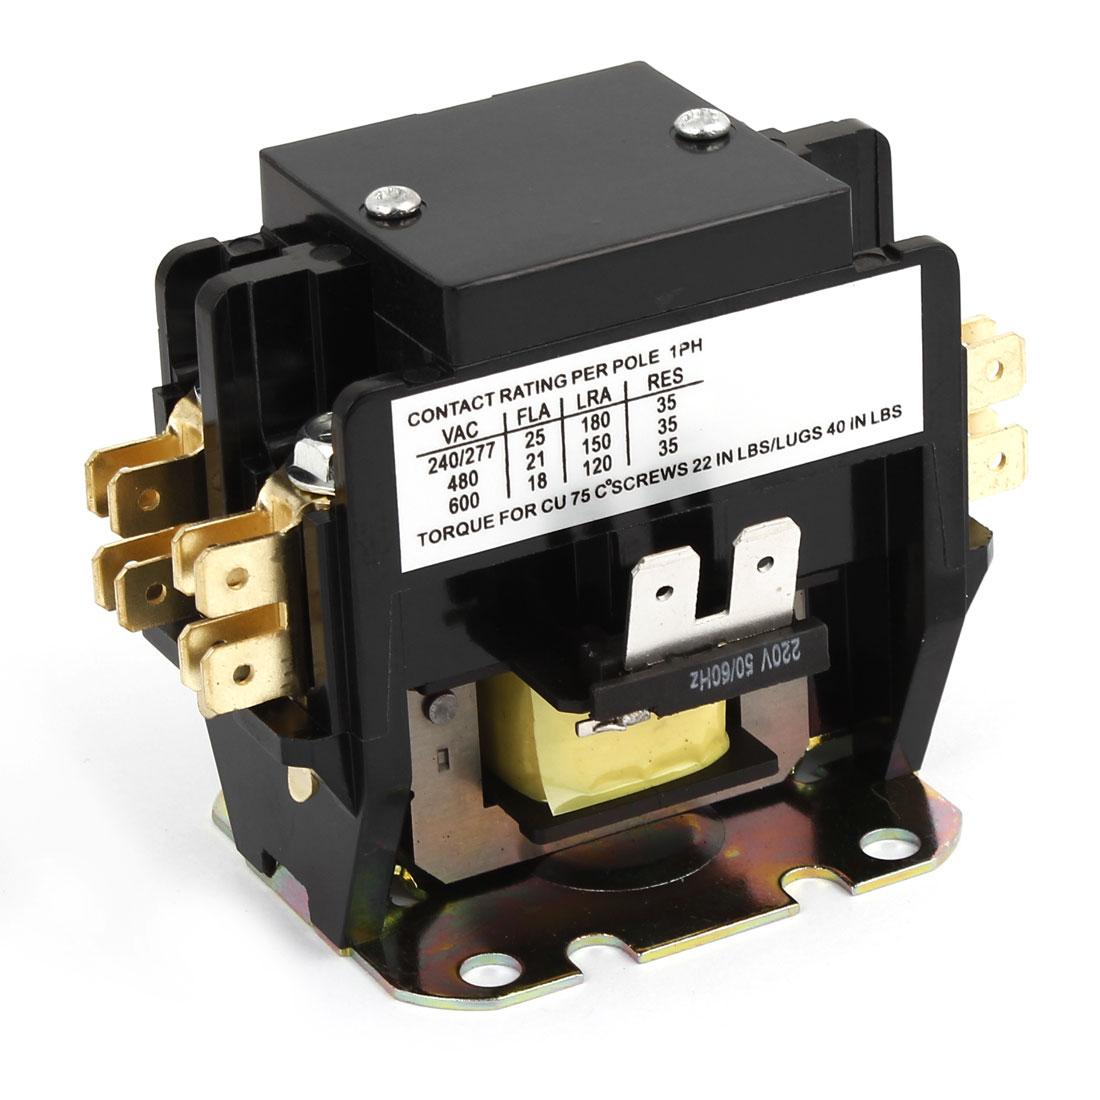 220V 50/60Hz Coil 1 Phase Air Conditioner Compressor Pump AC Contactor